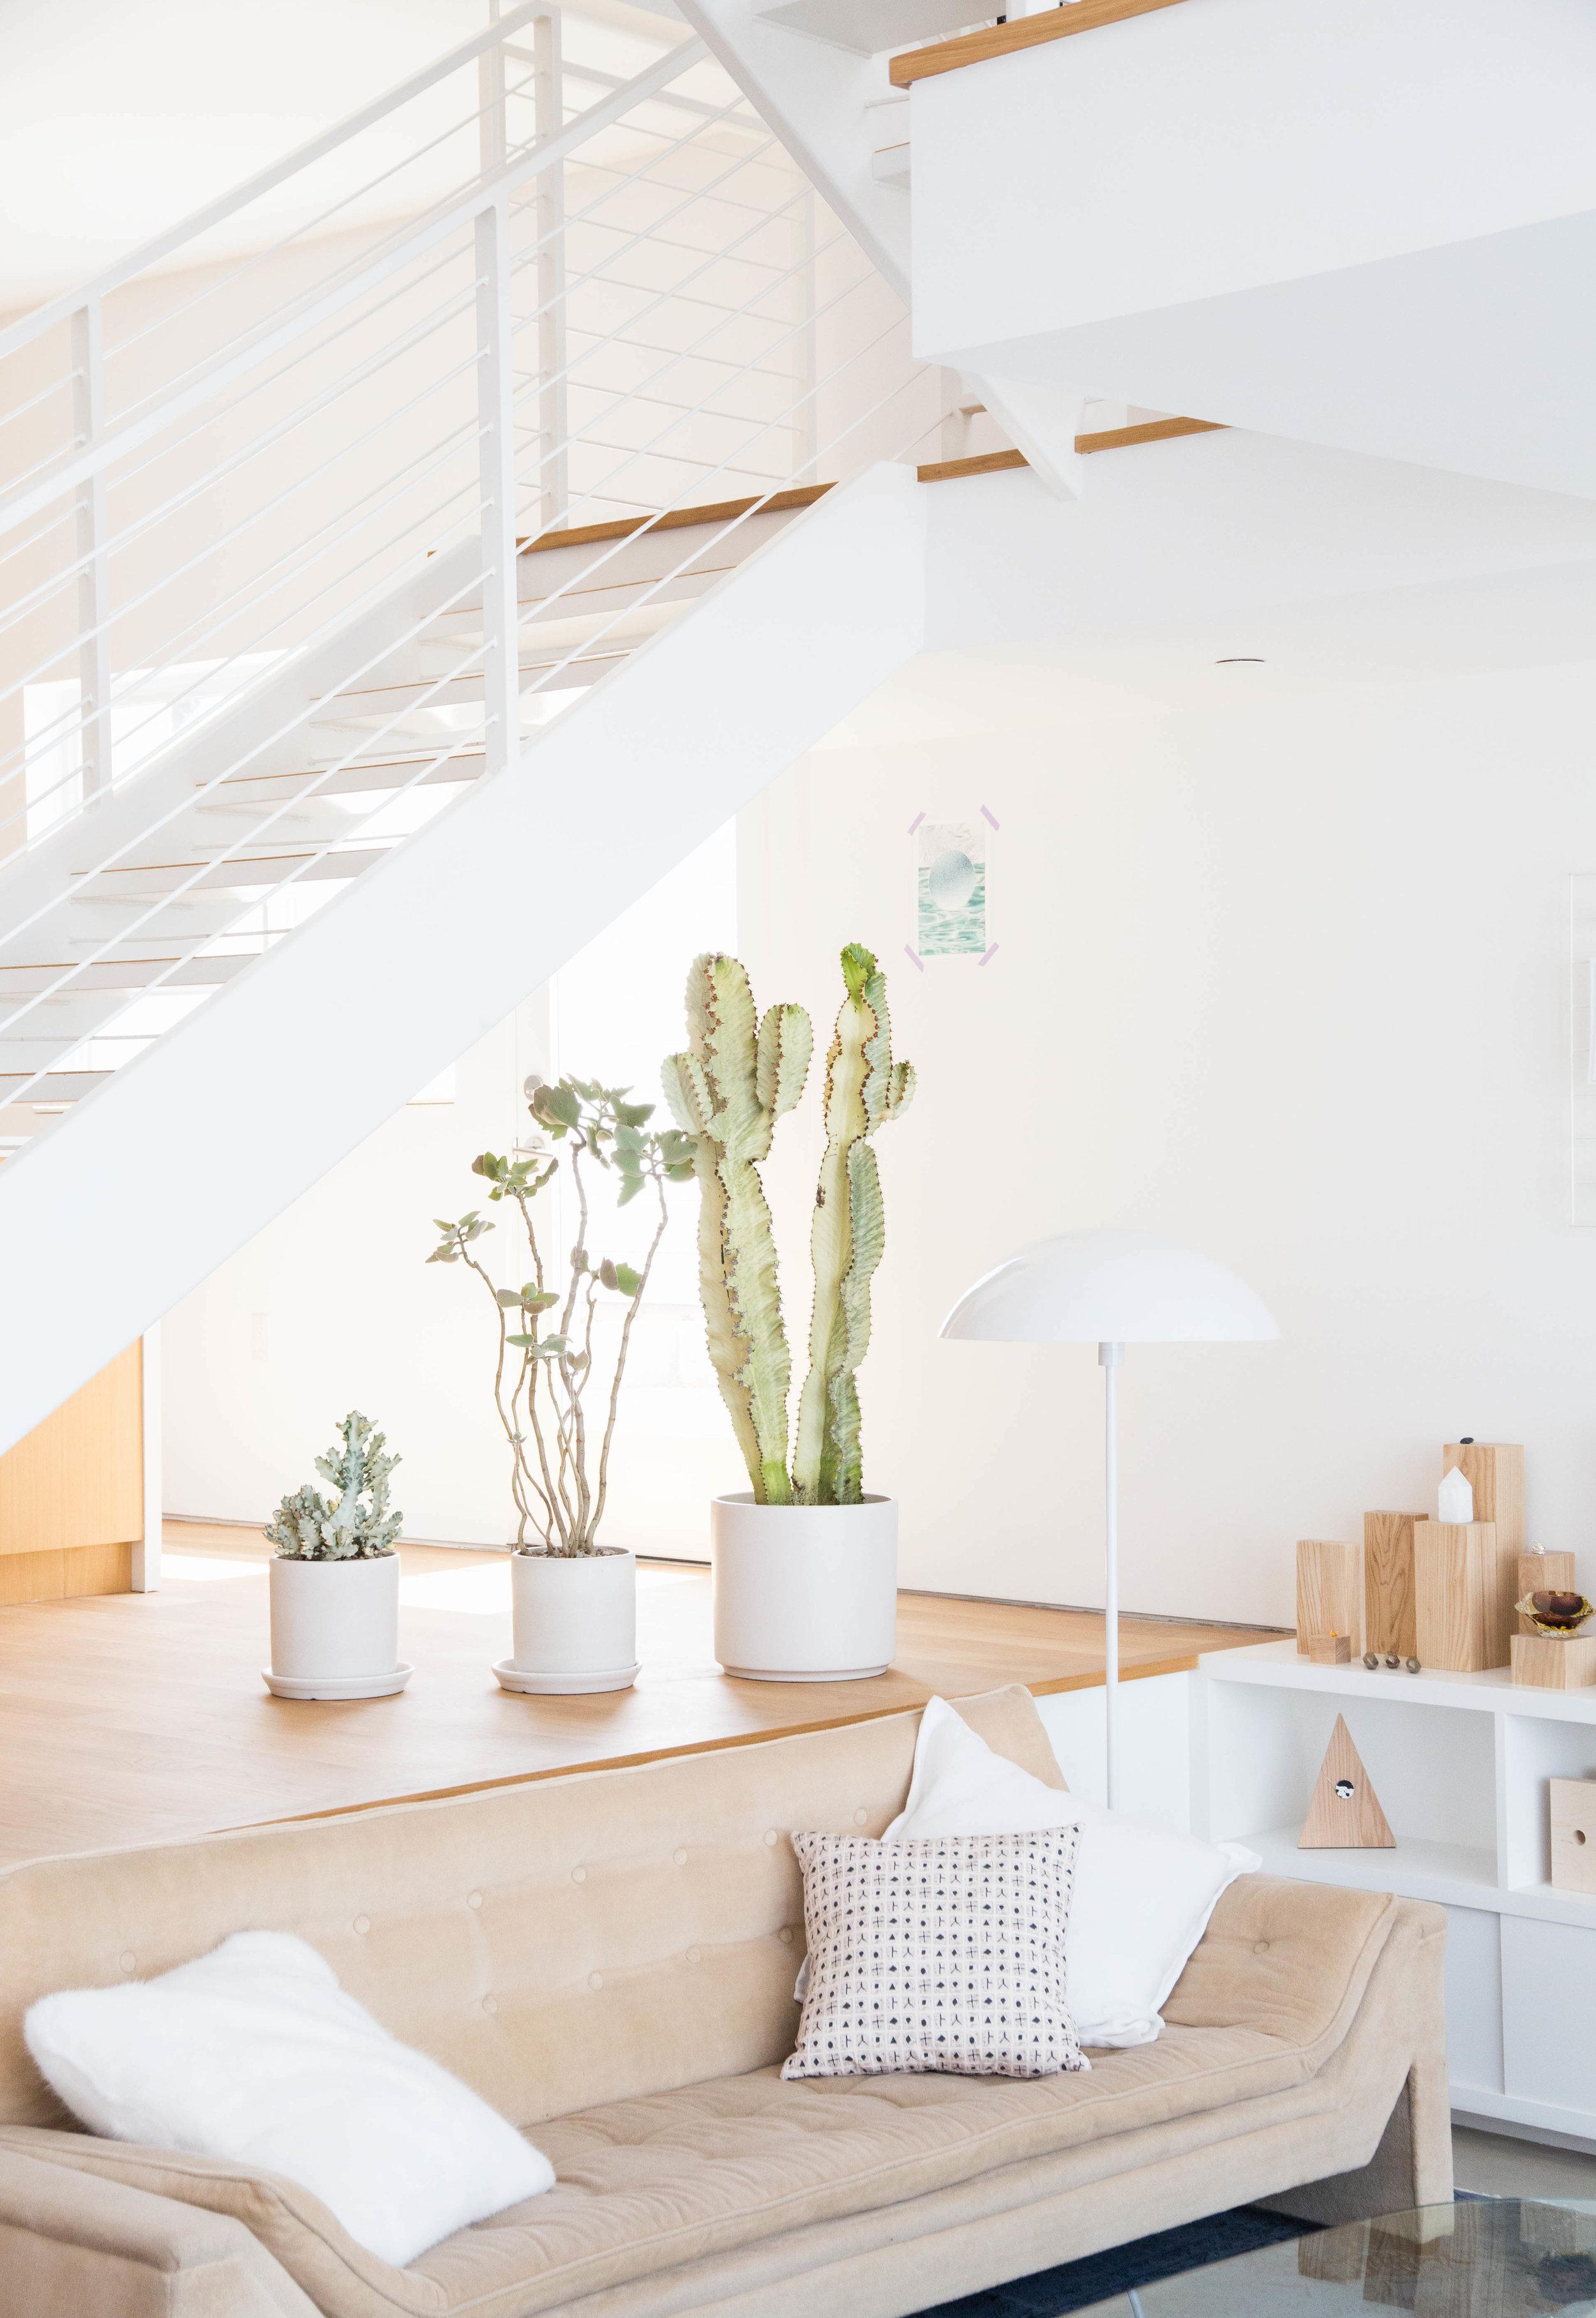 stefanistein-interiors-venice-neutrals-gondola-white-minimalist-edit